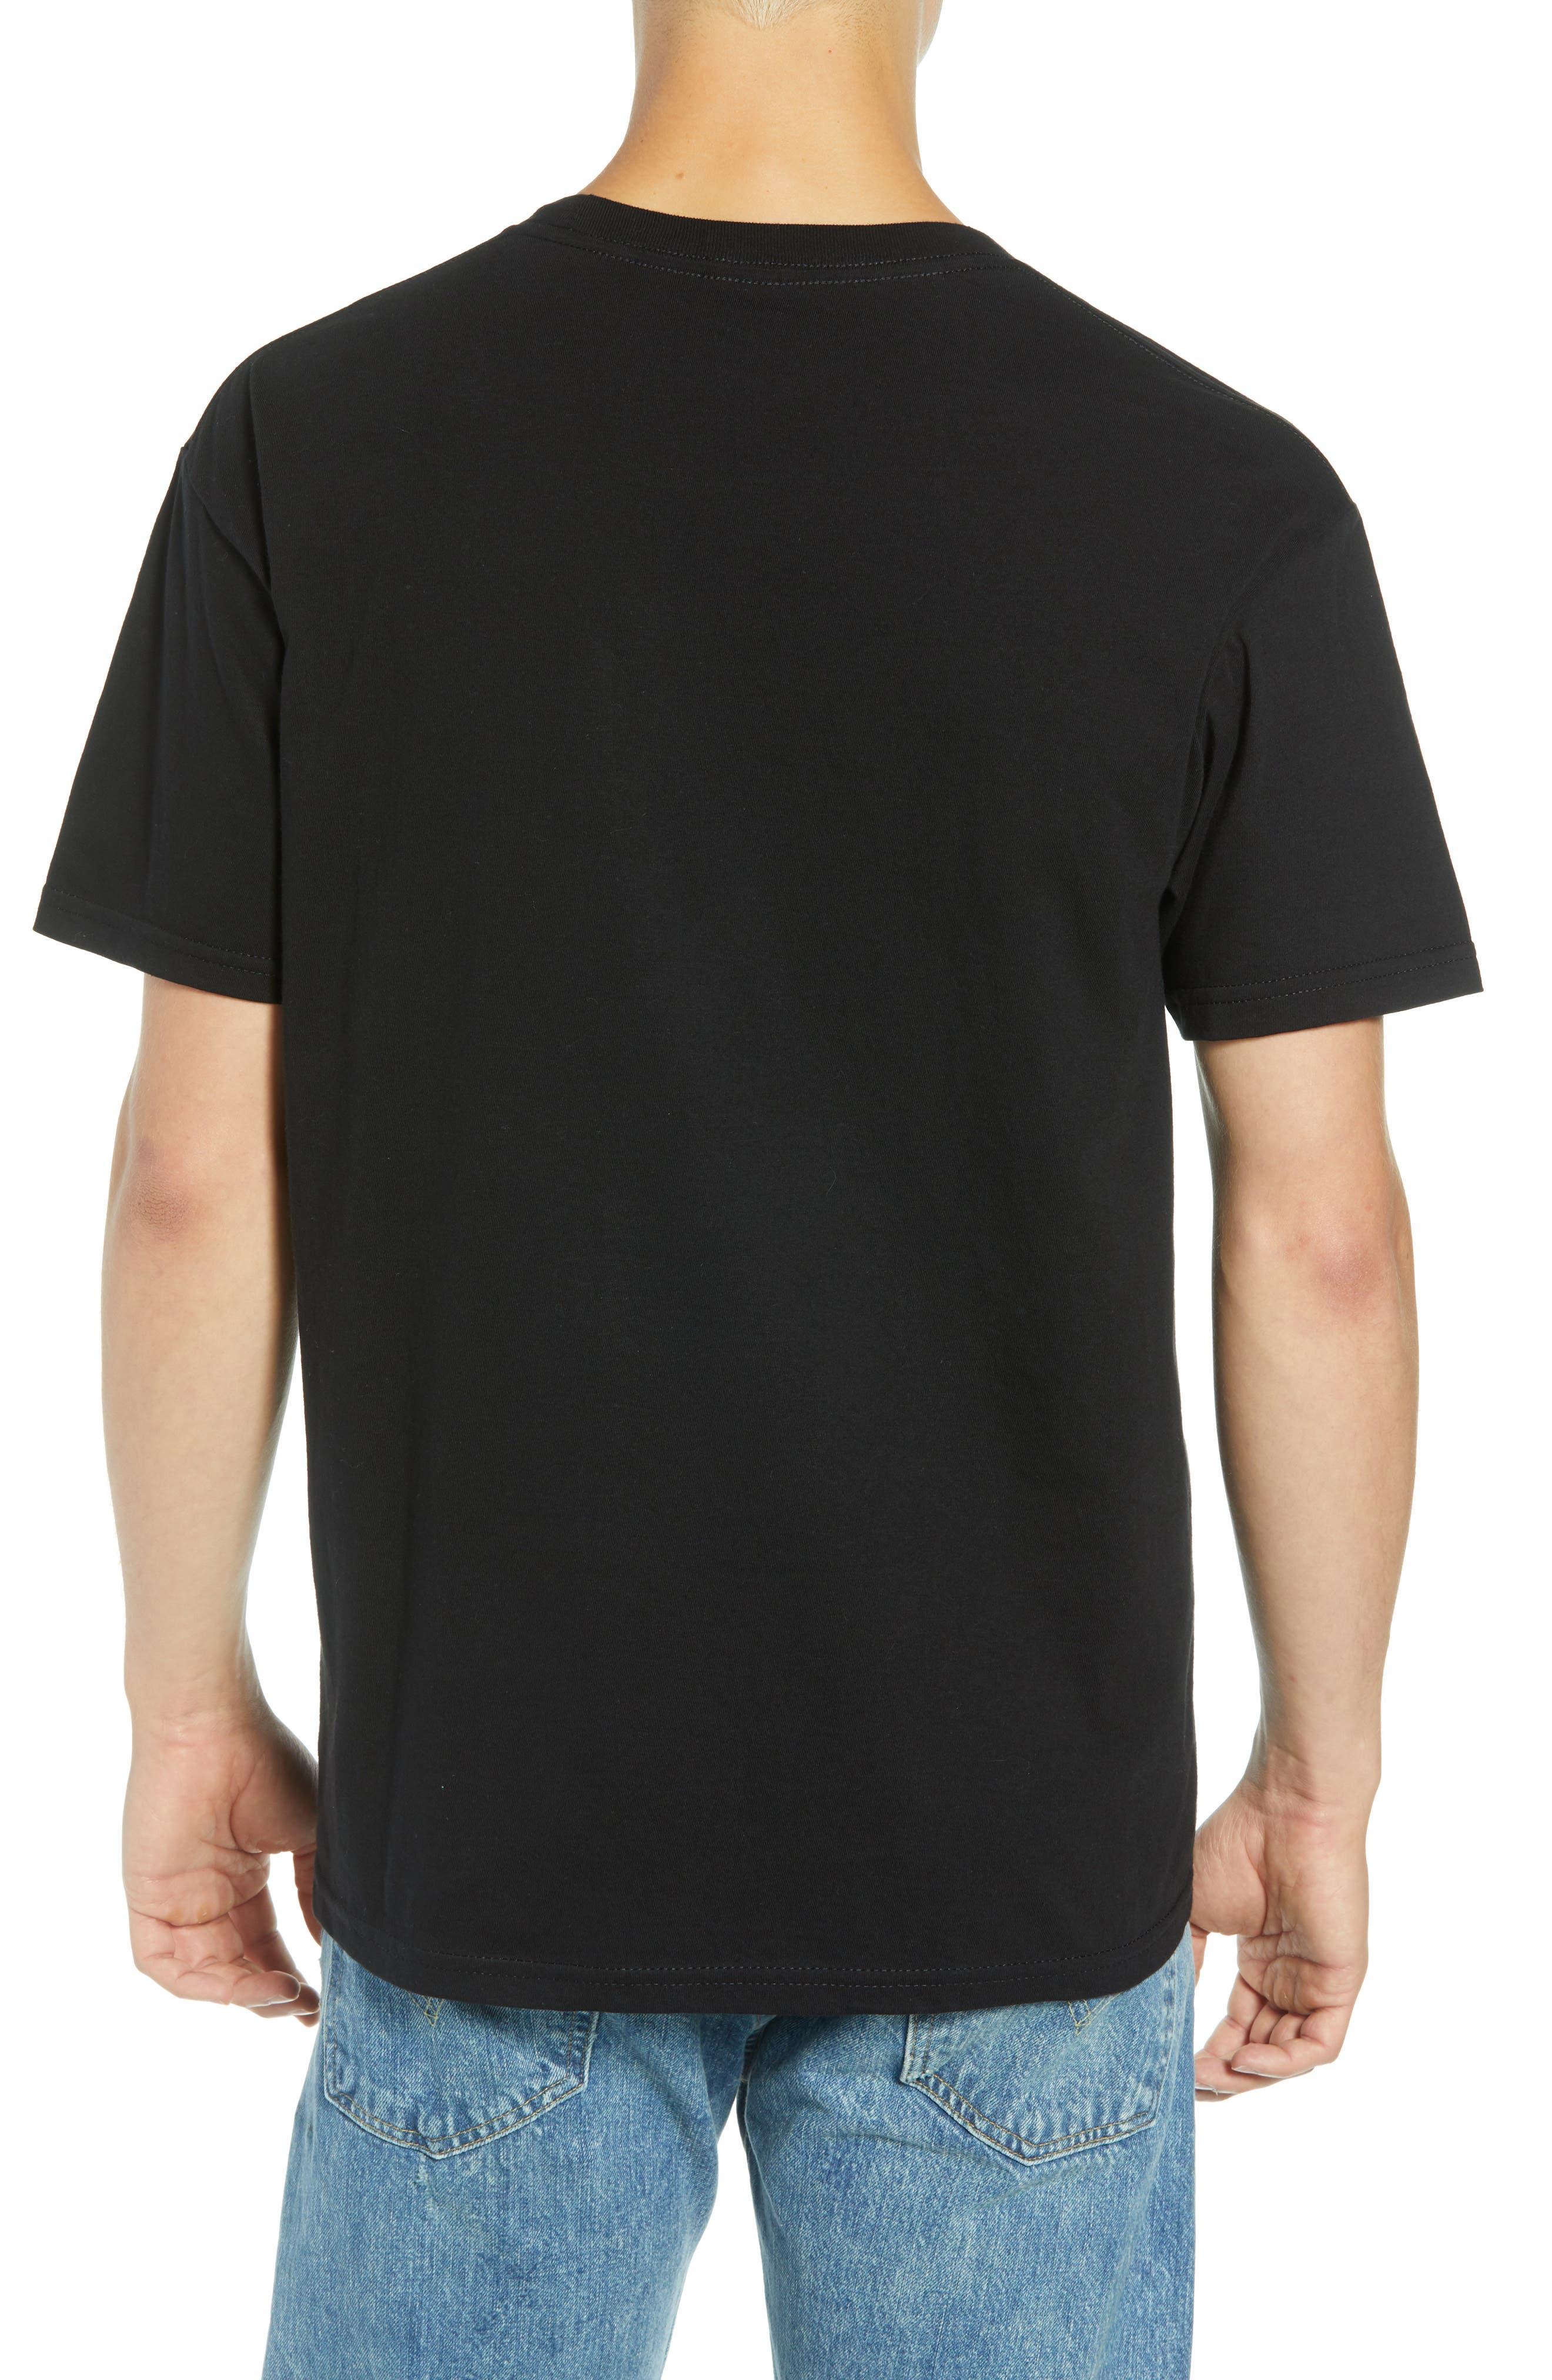 Ideal Power Premium T-Shirt,                             Alternate thumbnail 2, color,                             BLACK